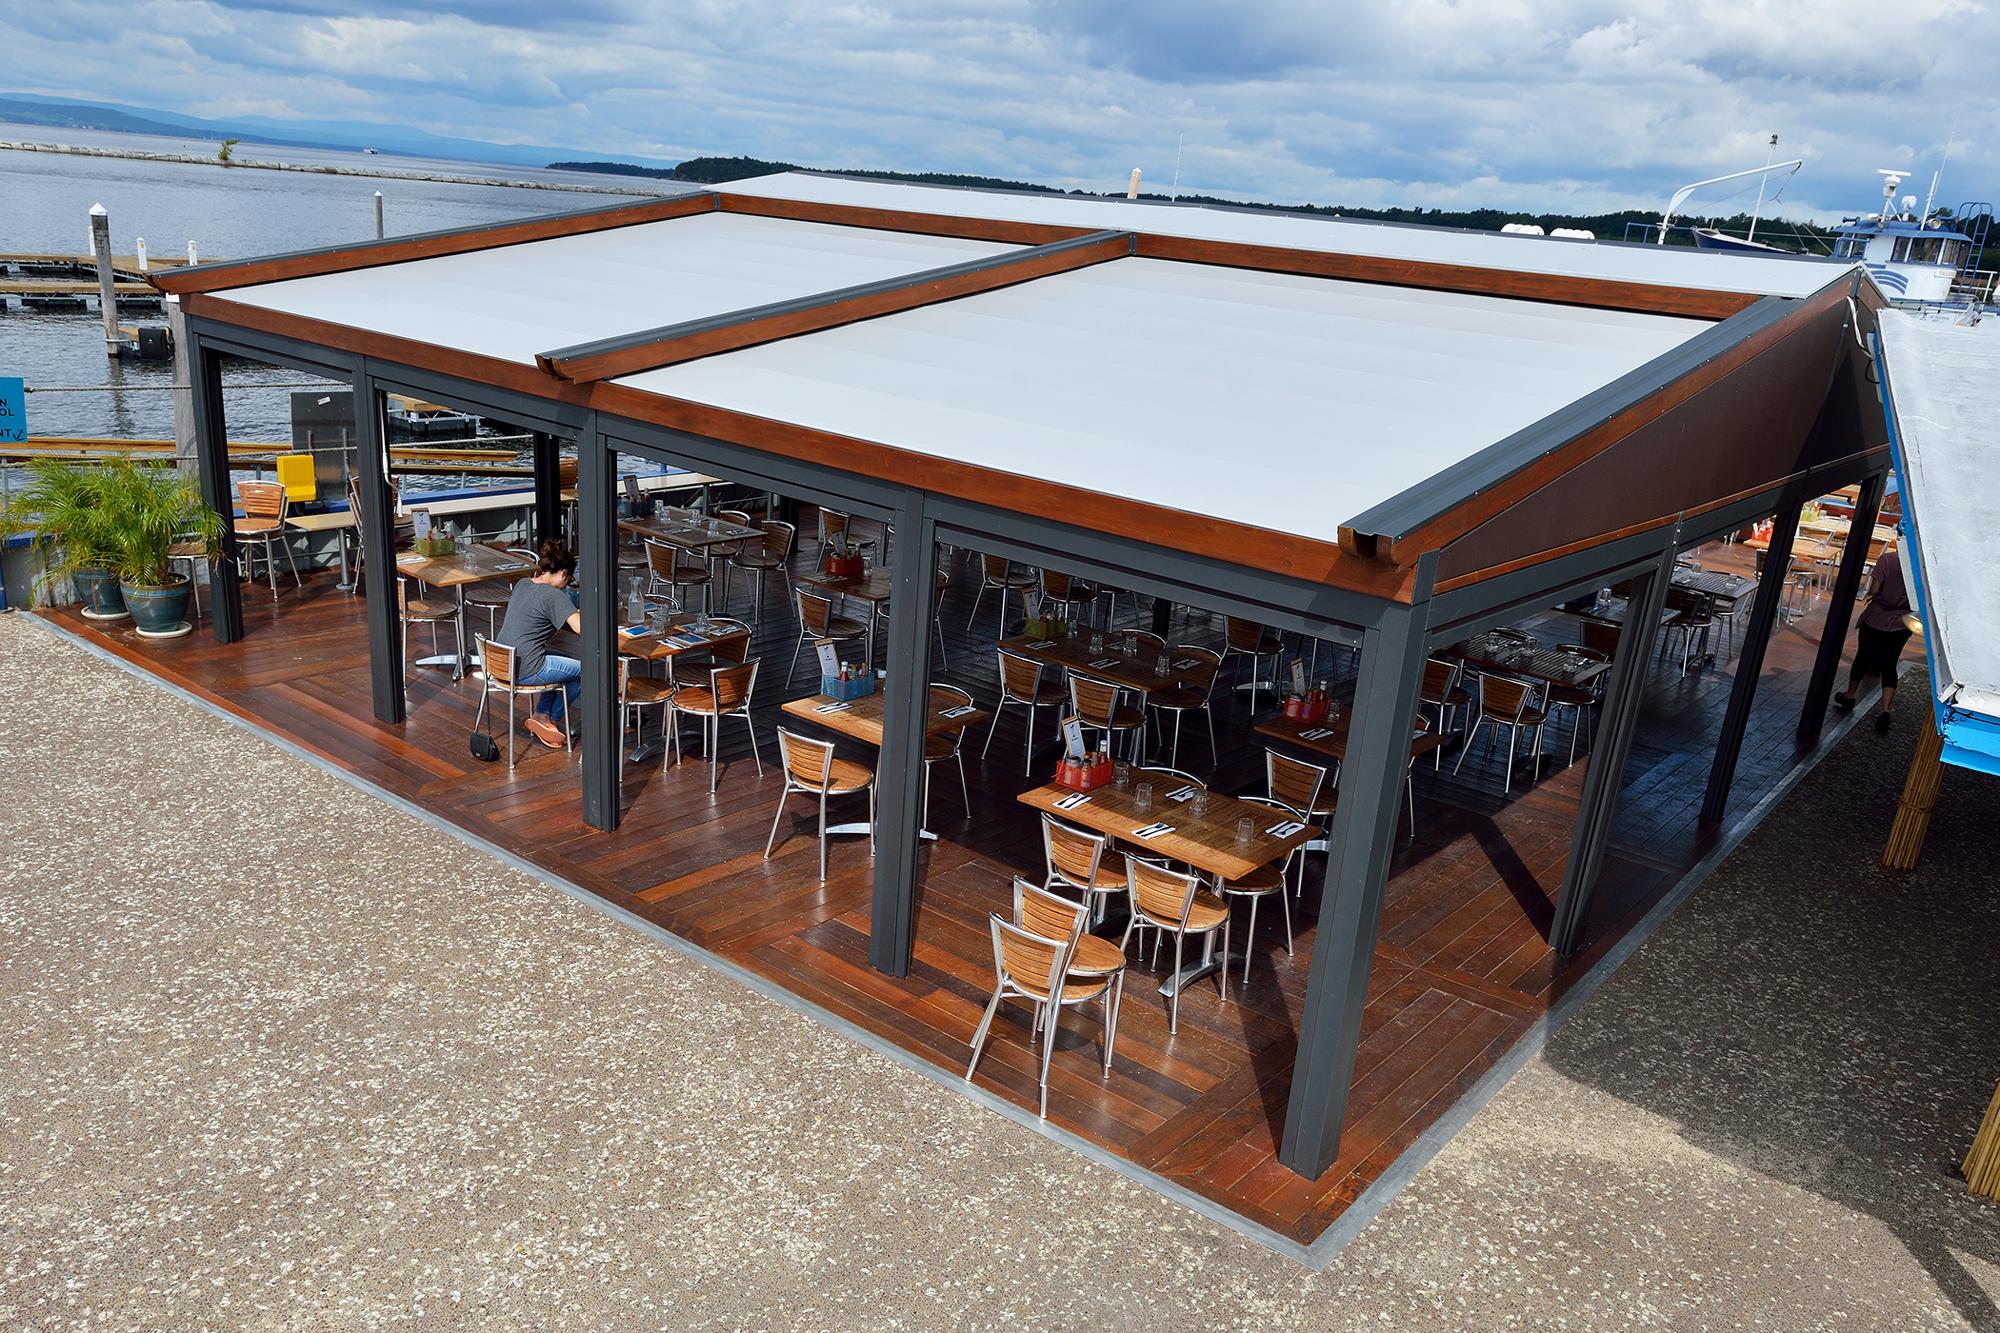 Gennius Waterproof Retractable Pergola Awning Enclosures Retractable Roof The Gennius I Retractable Pergola Pergola Ideas For Patio Building A Pergola